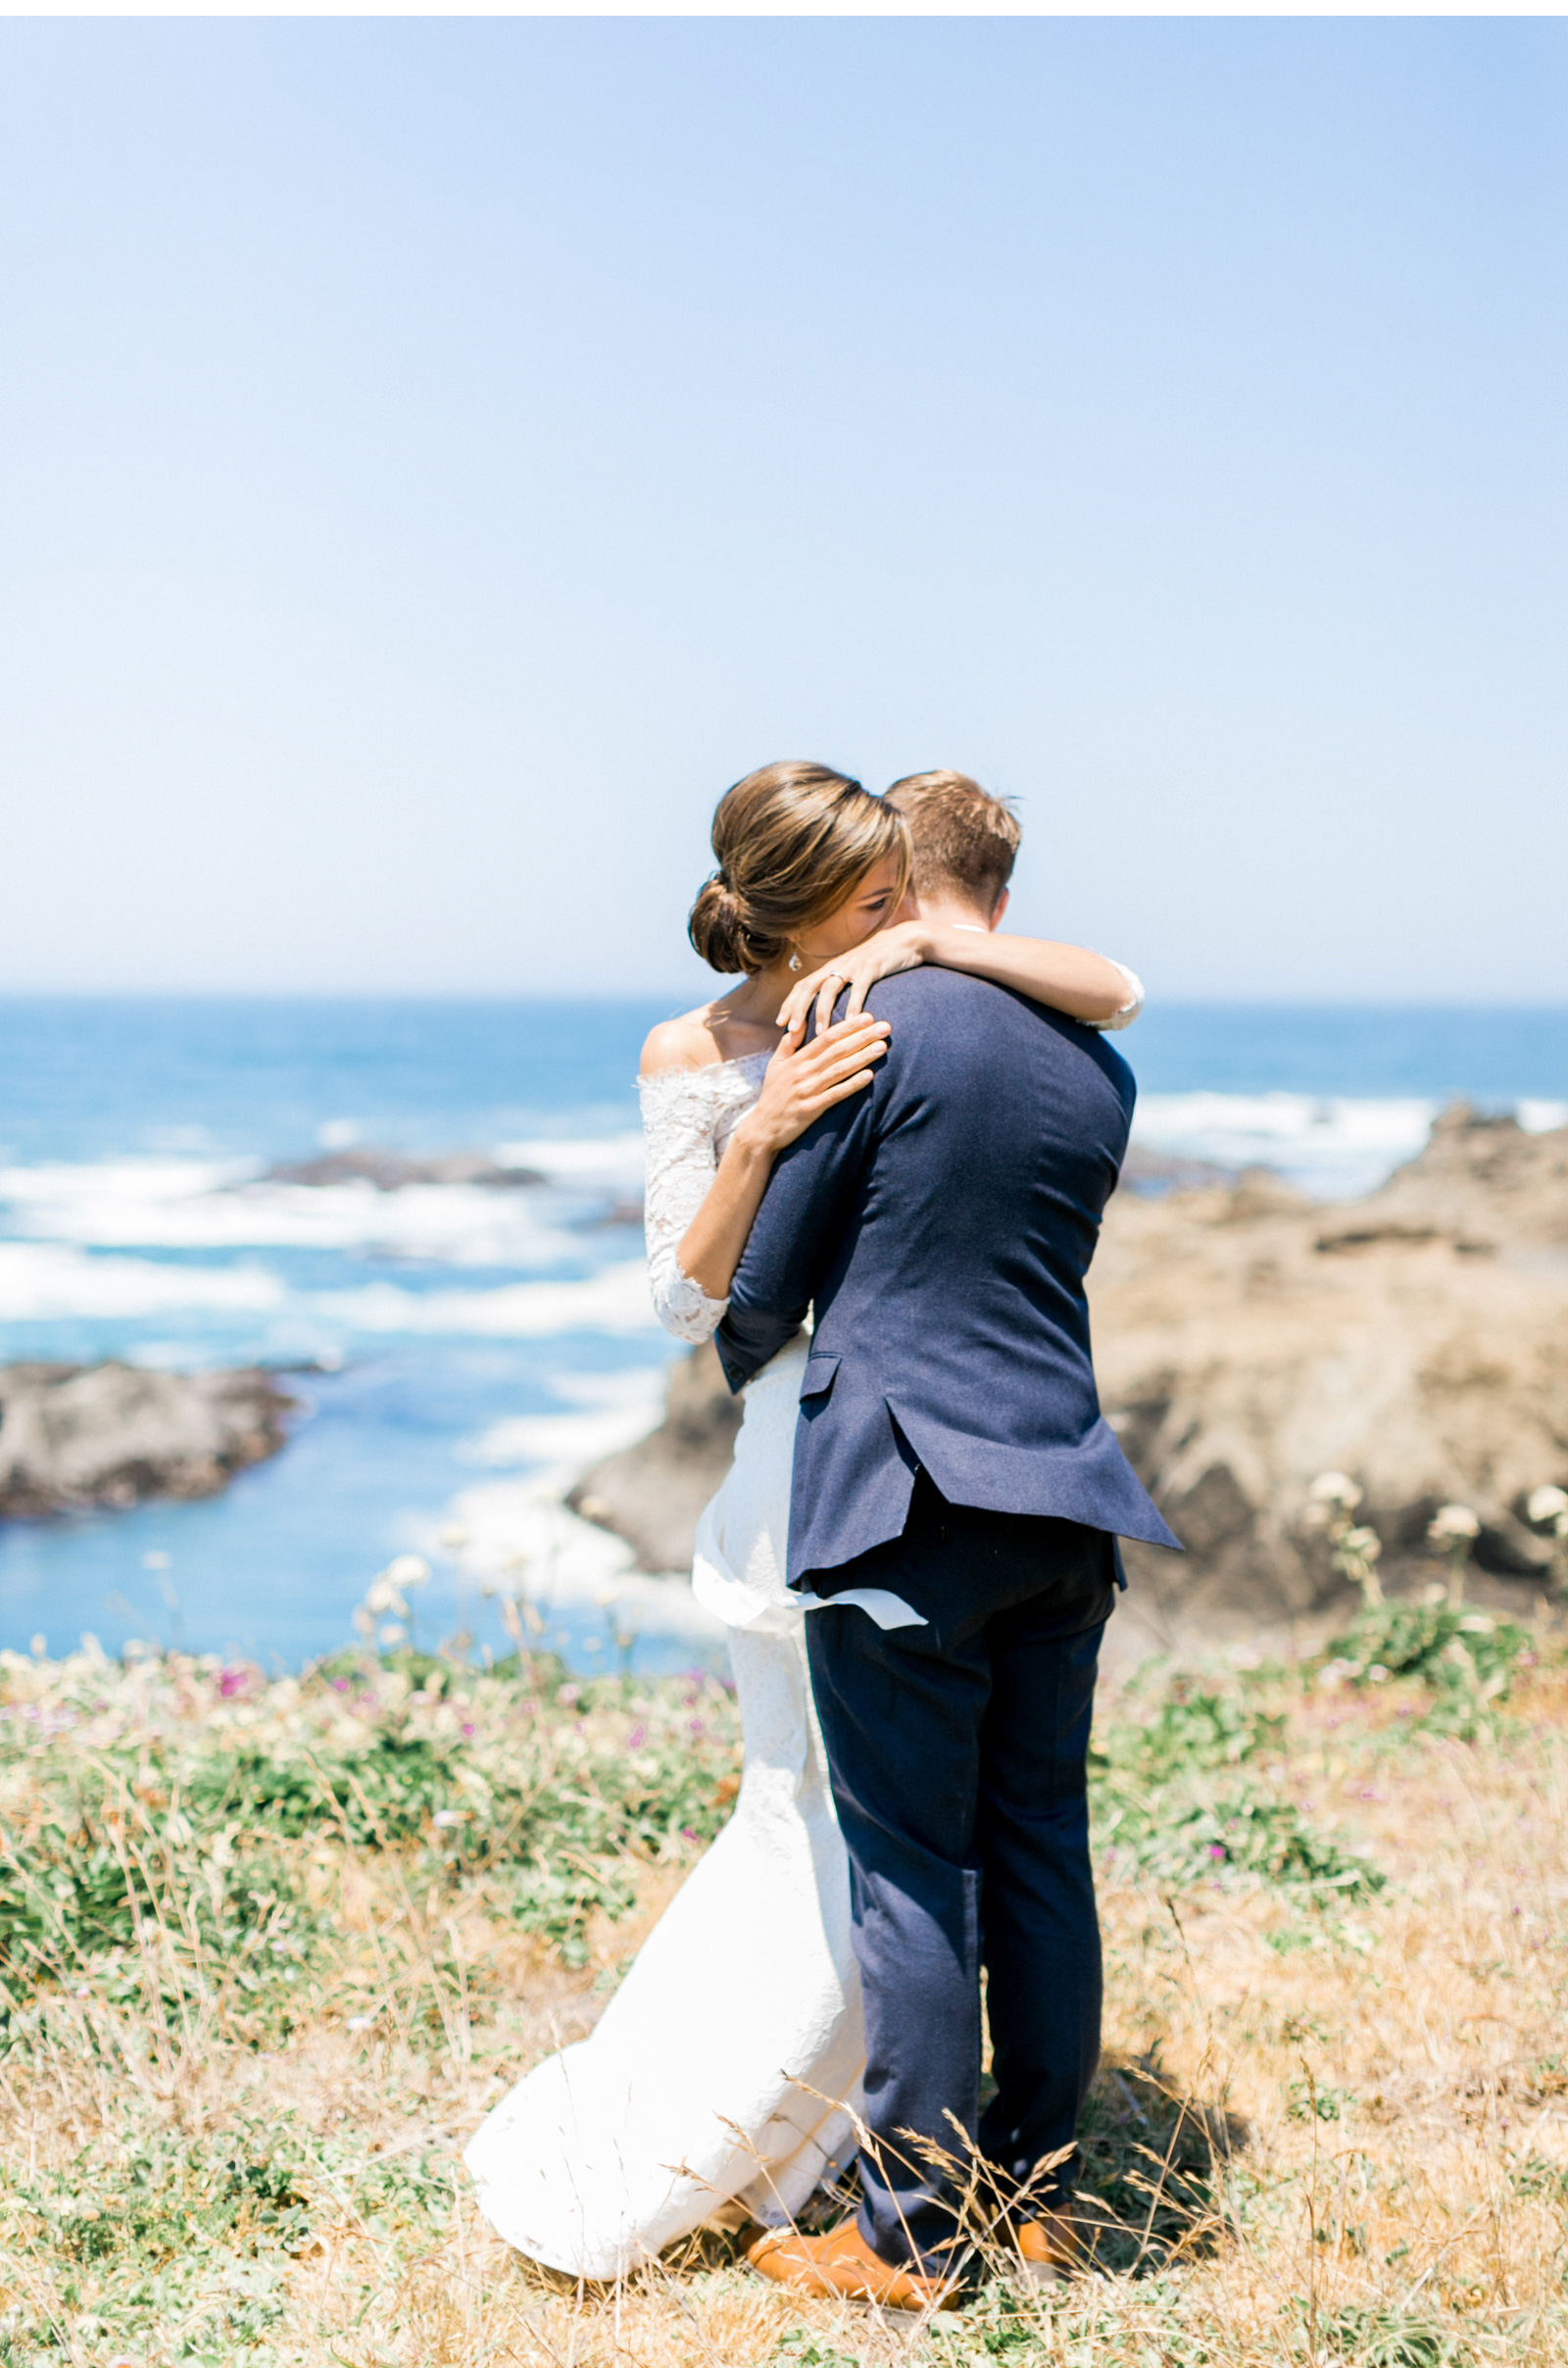 Mendocino-wedding-photographer-natalie-schutt-photography_11.jpg